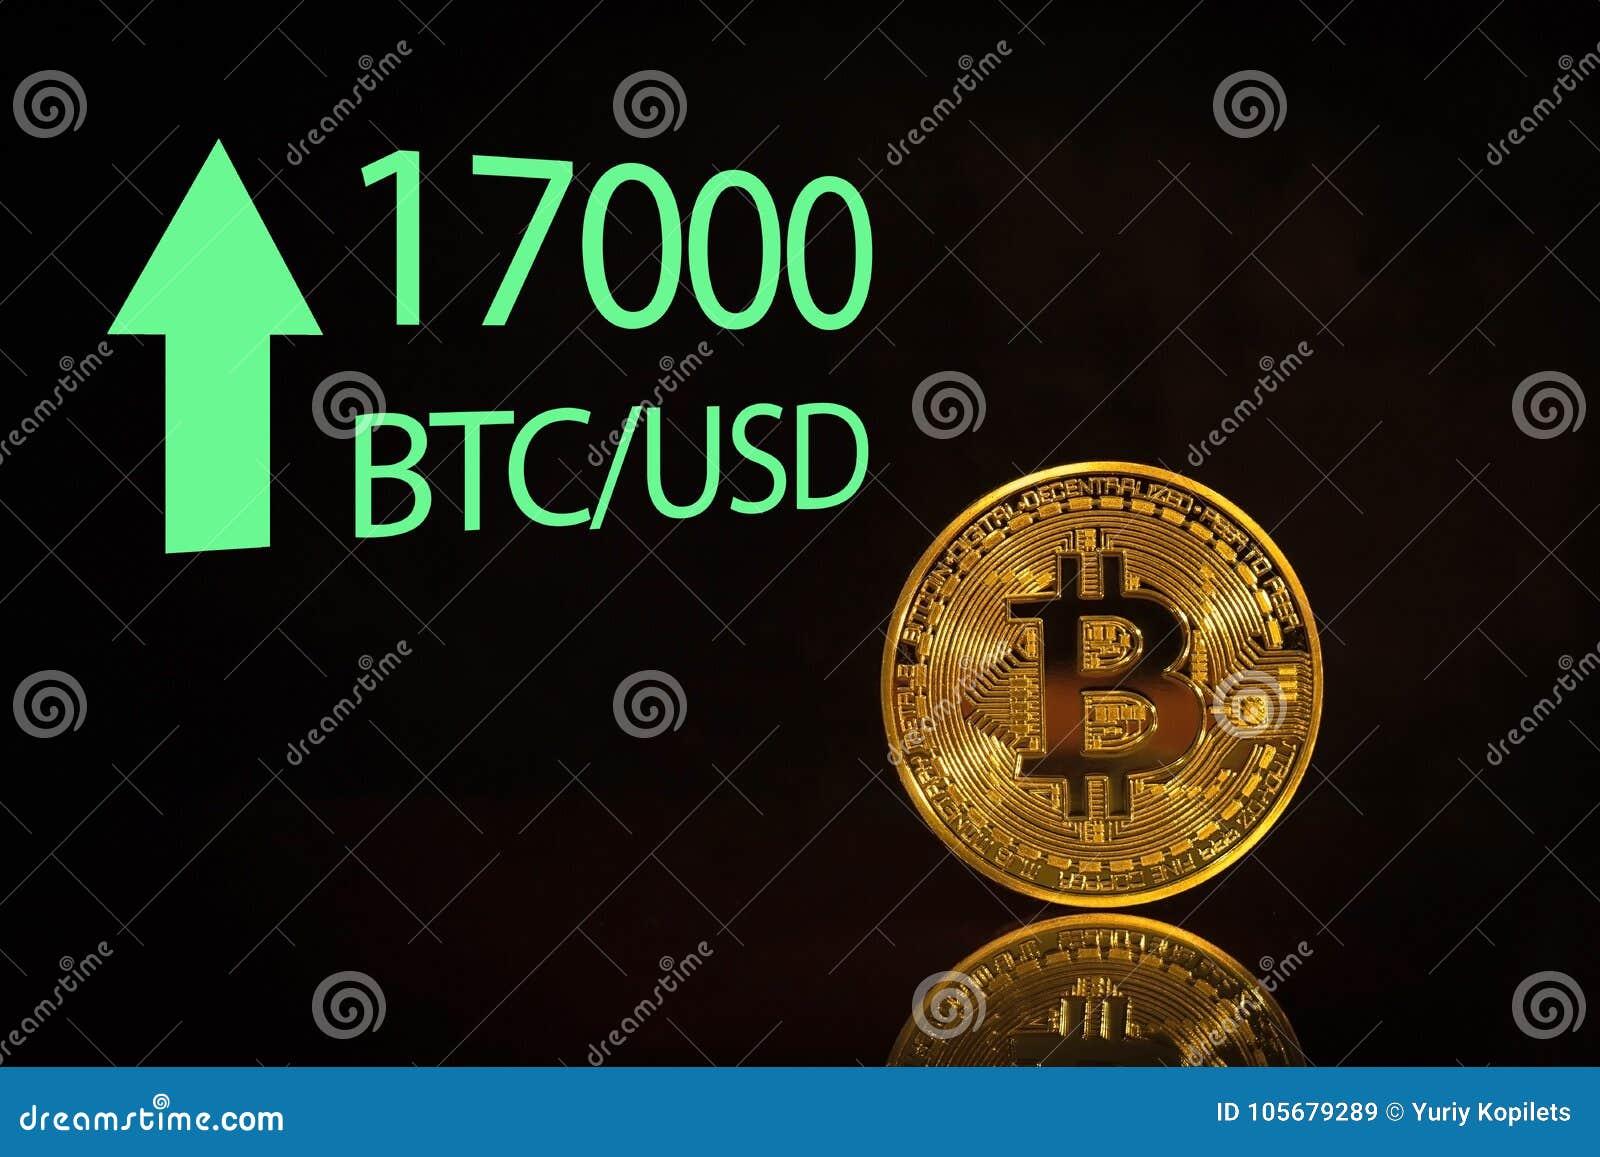 17000 bitcoins to dollars binary options hacking